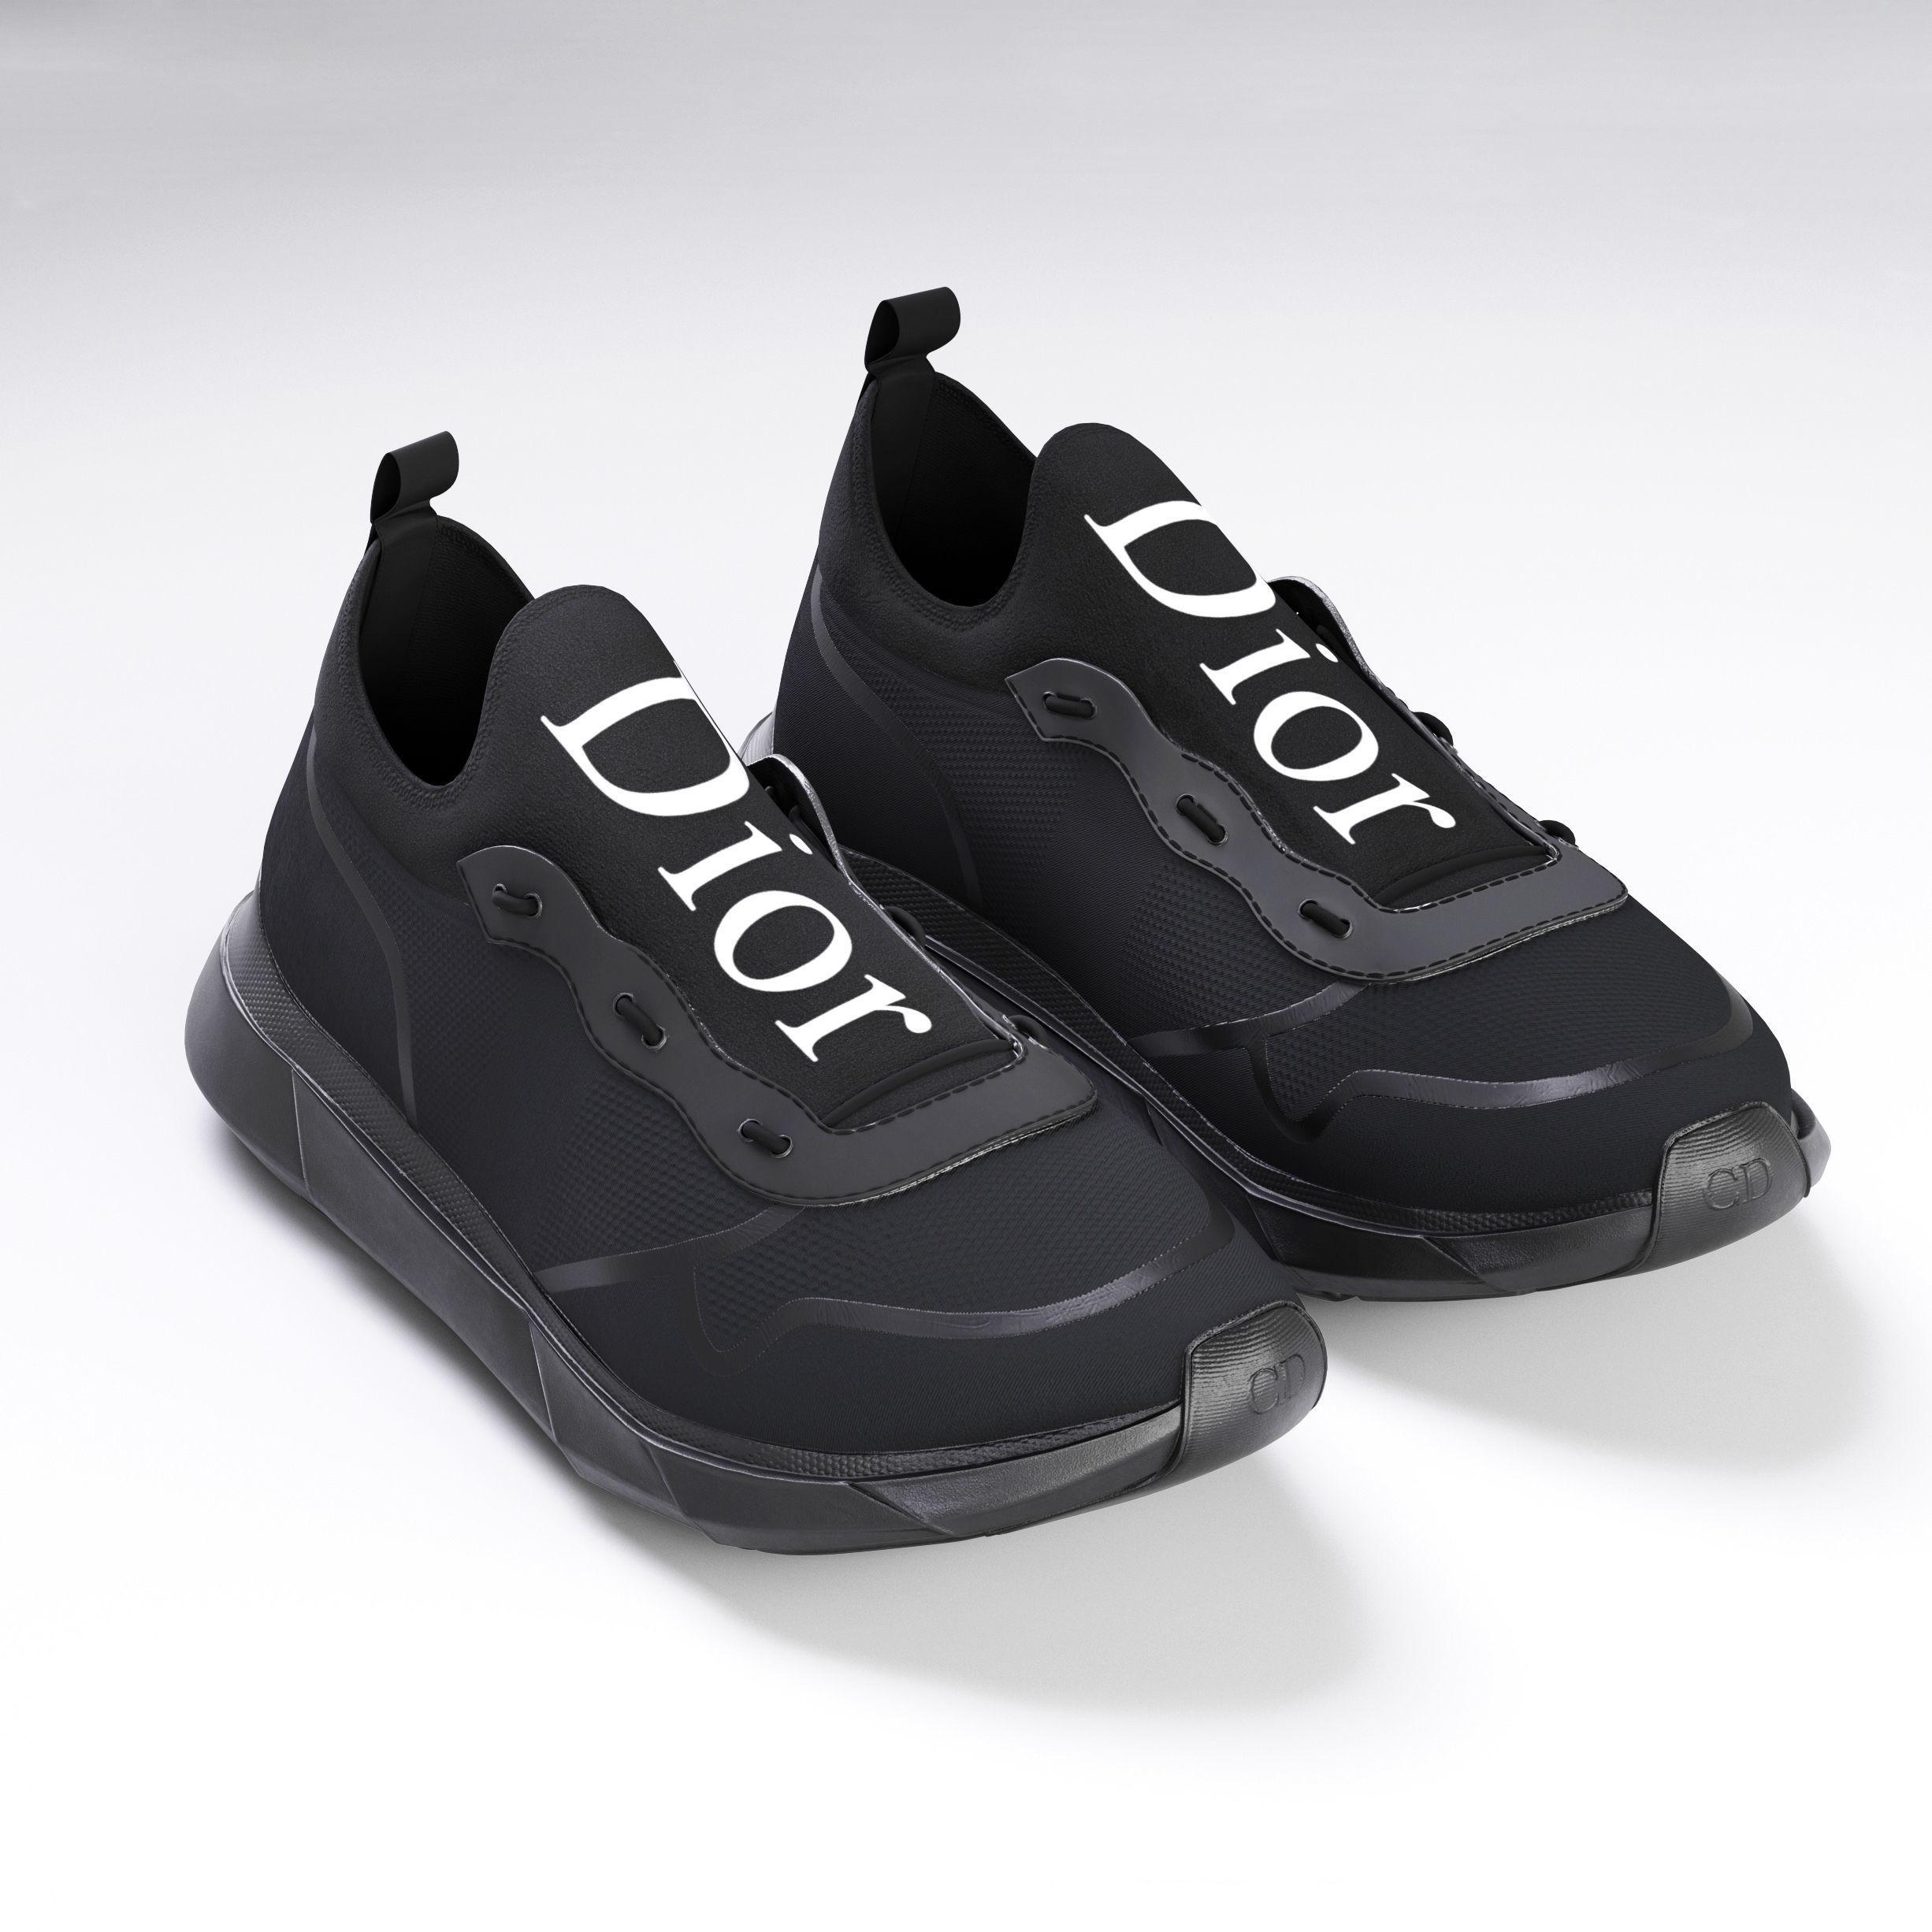 black dior shoes, OFF 79%,Buy!